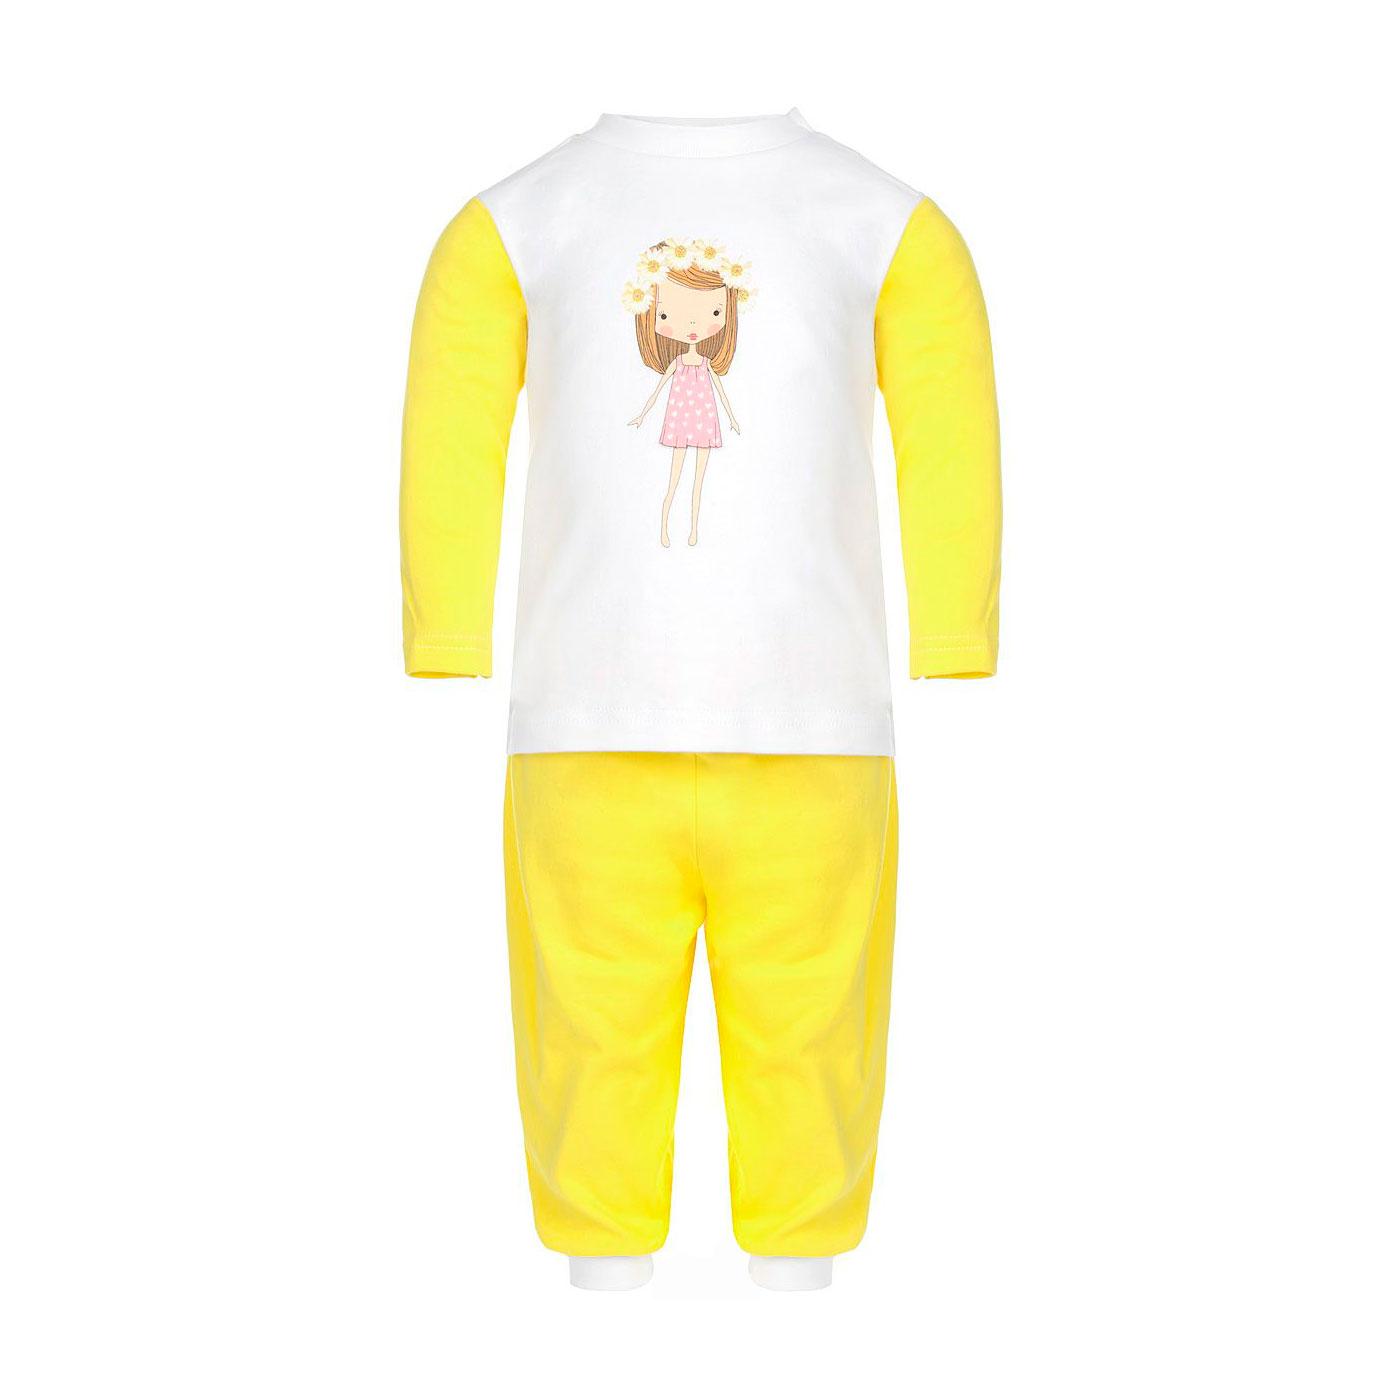 Пижама Котмаркот Ромашки рост 92 желтый<br>